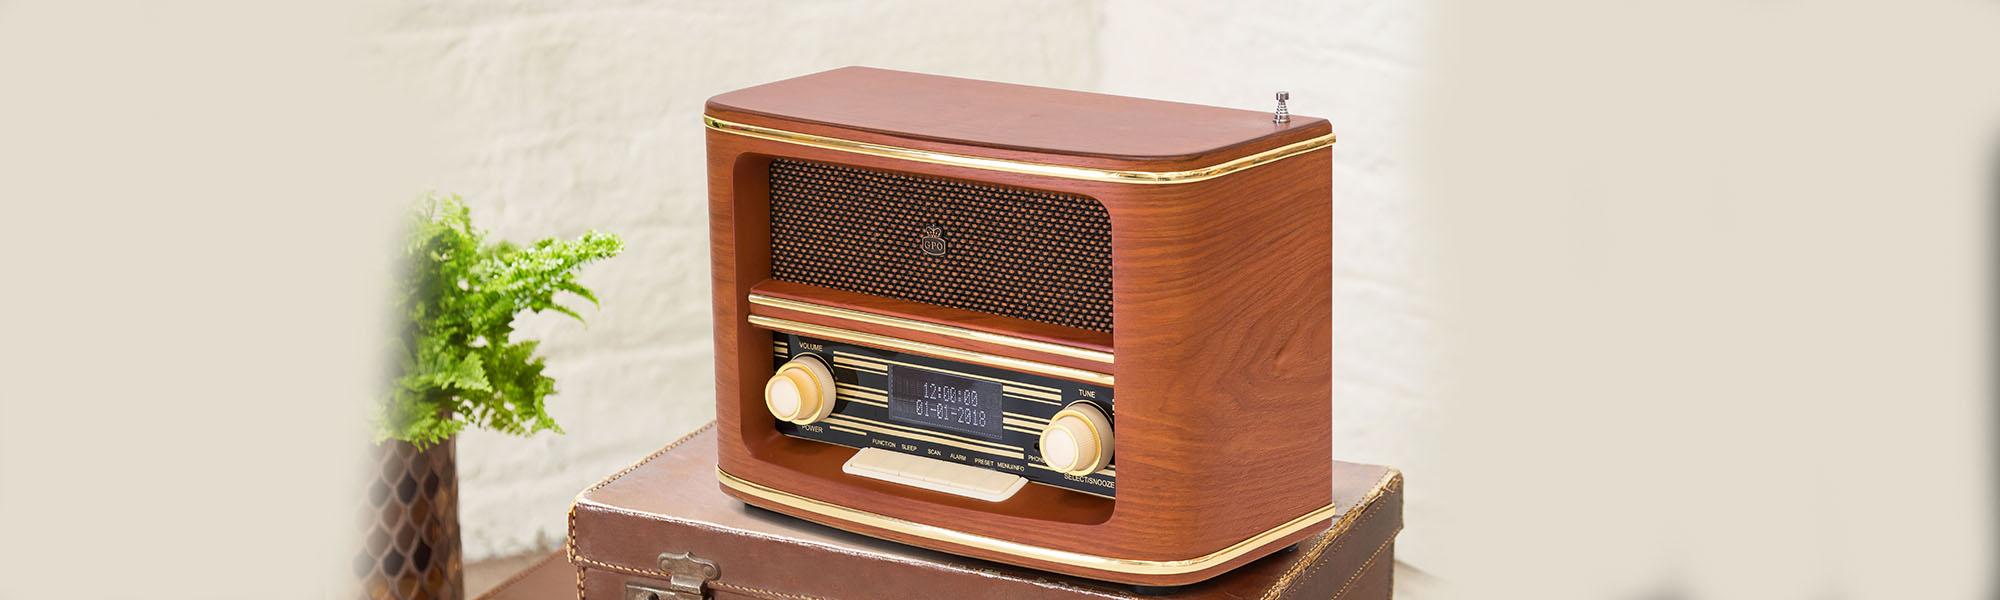 Retro DAB Radios,Cheap Digital Radios